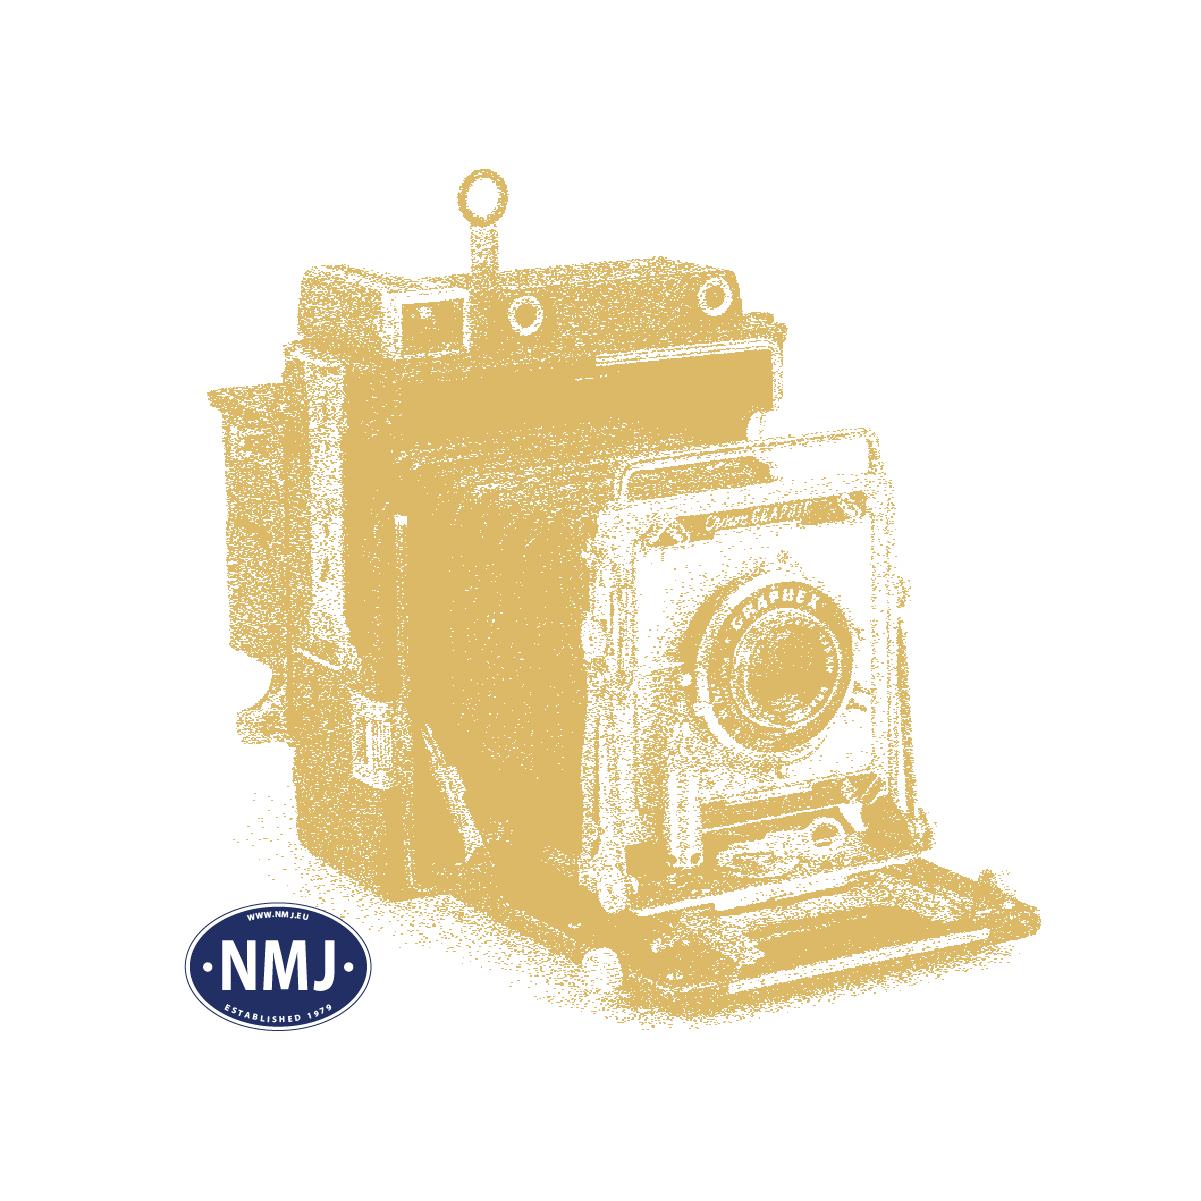 NMJT90006 - NMJ Topline NSB Di3a 608, Gammeldesign, DC